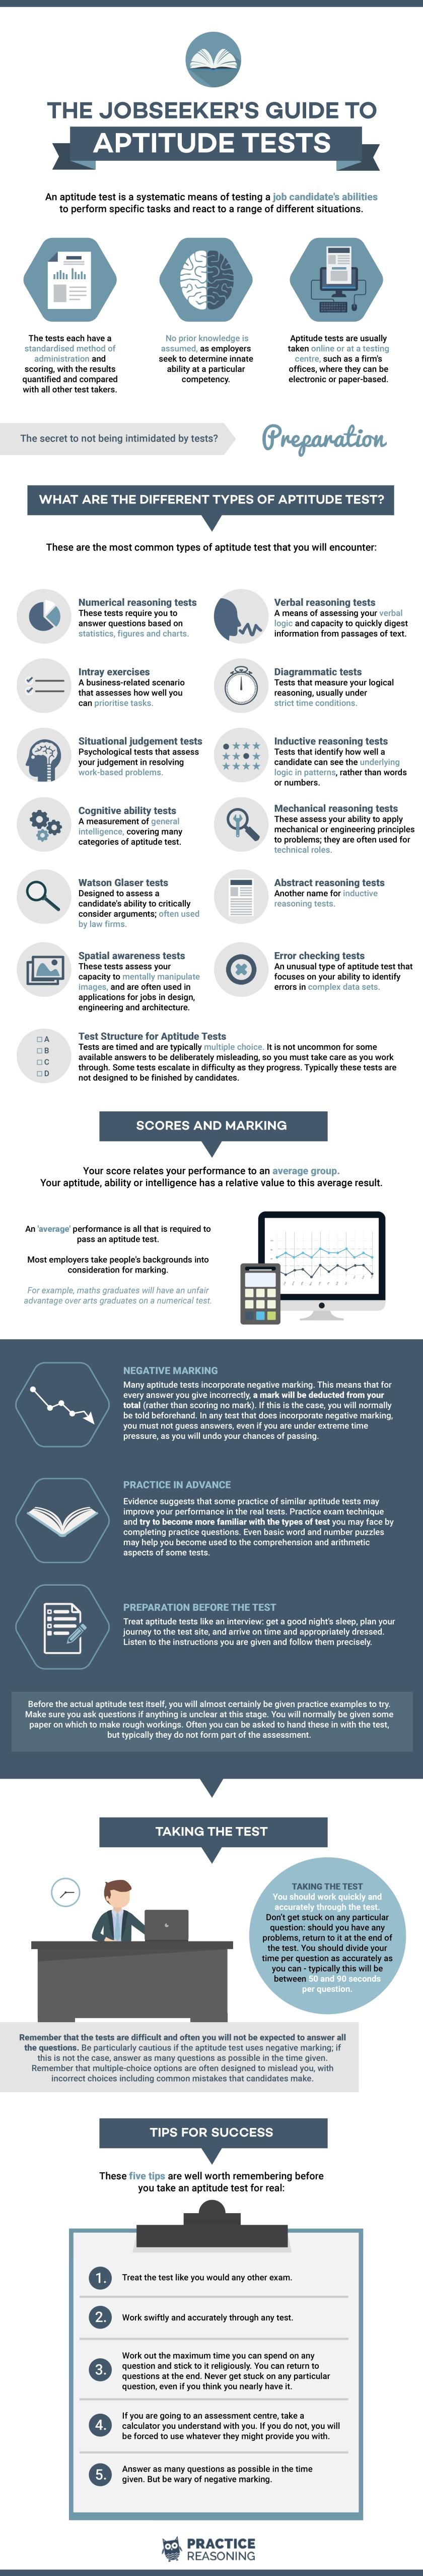 Aptitude tests-infographic